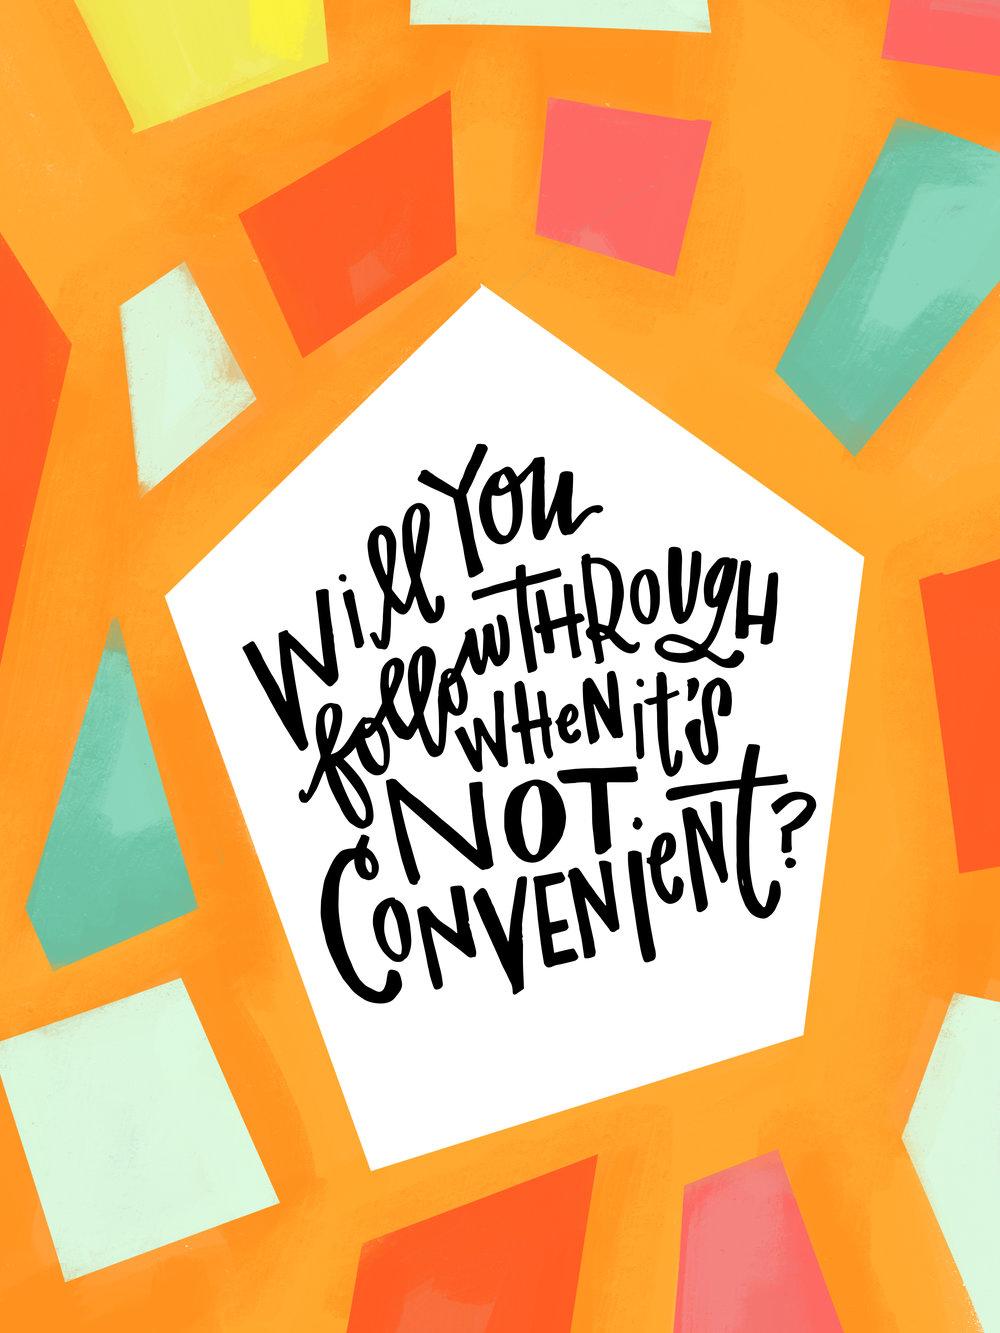 5/29/16: Convenient